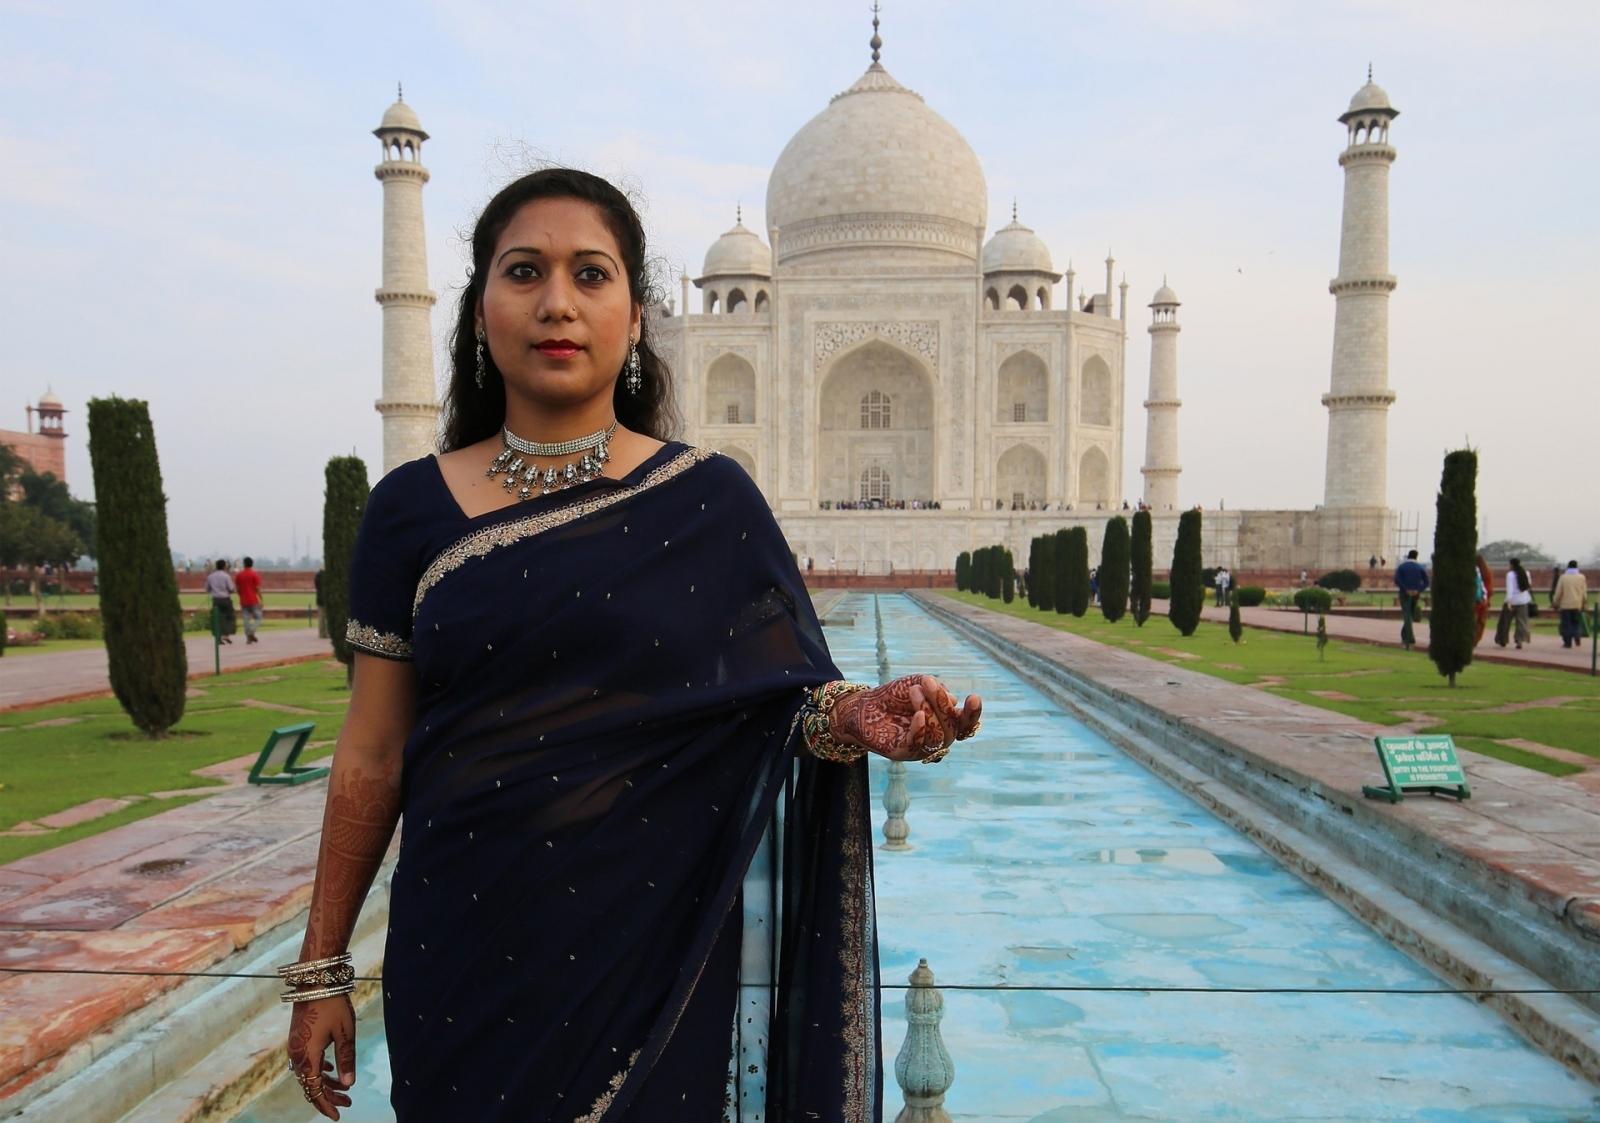 Taj Mahal Agra India henna banita tour operator